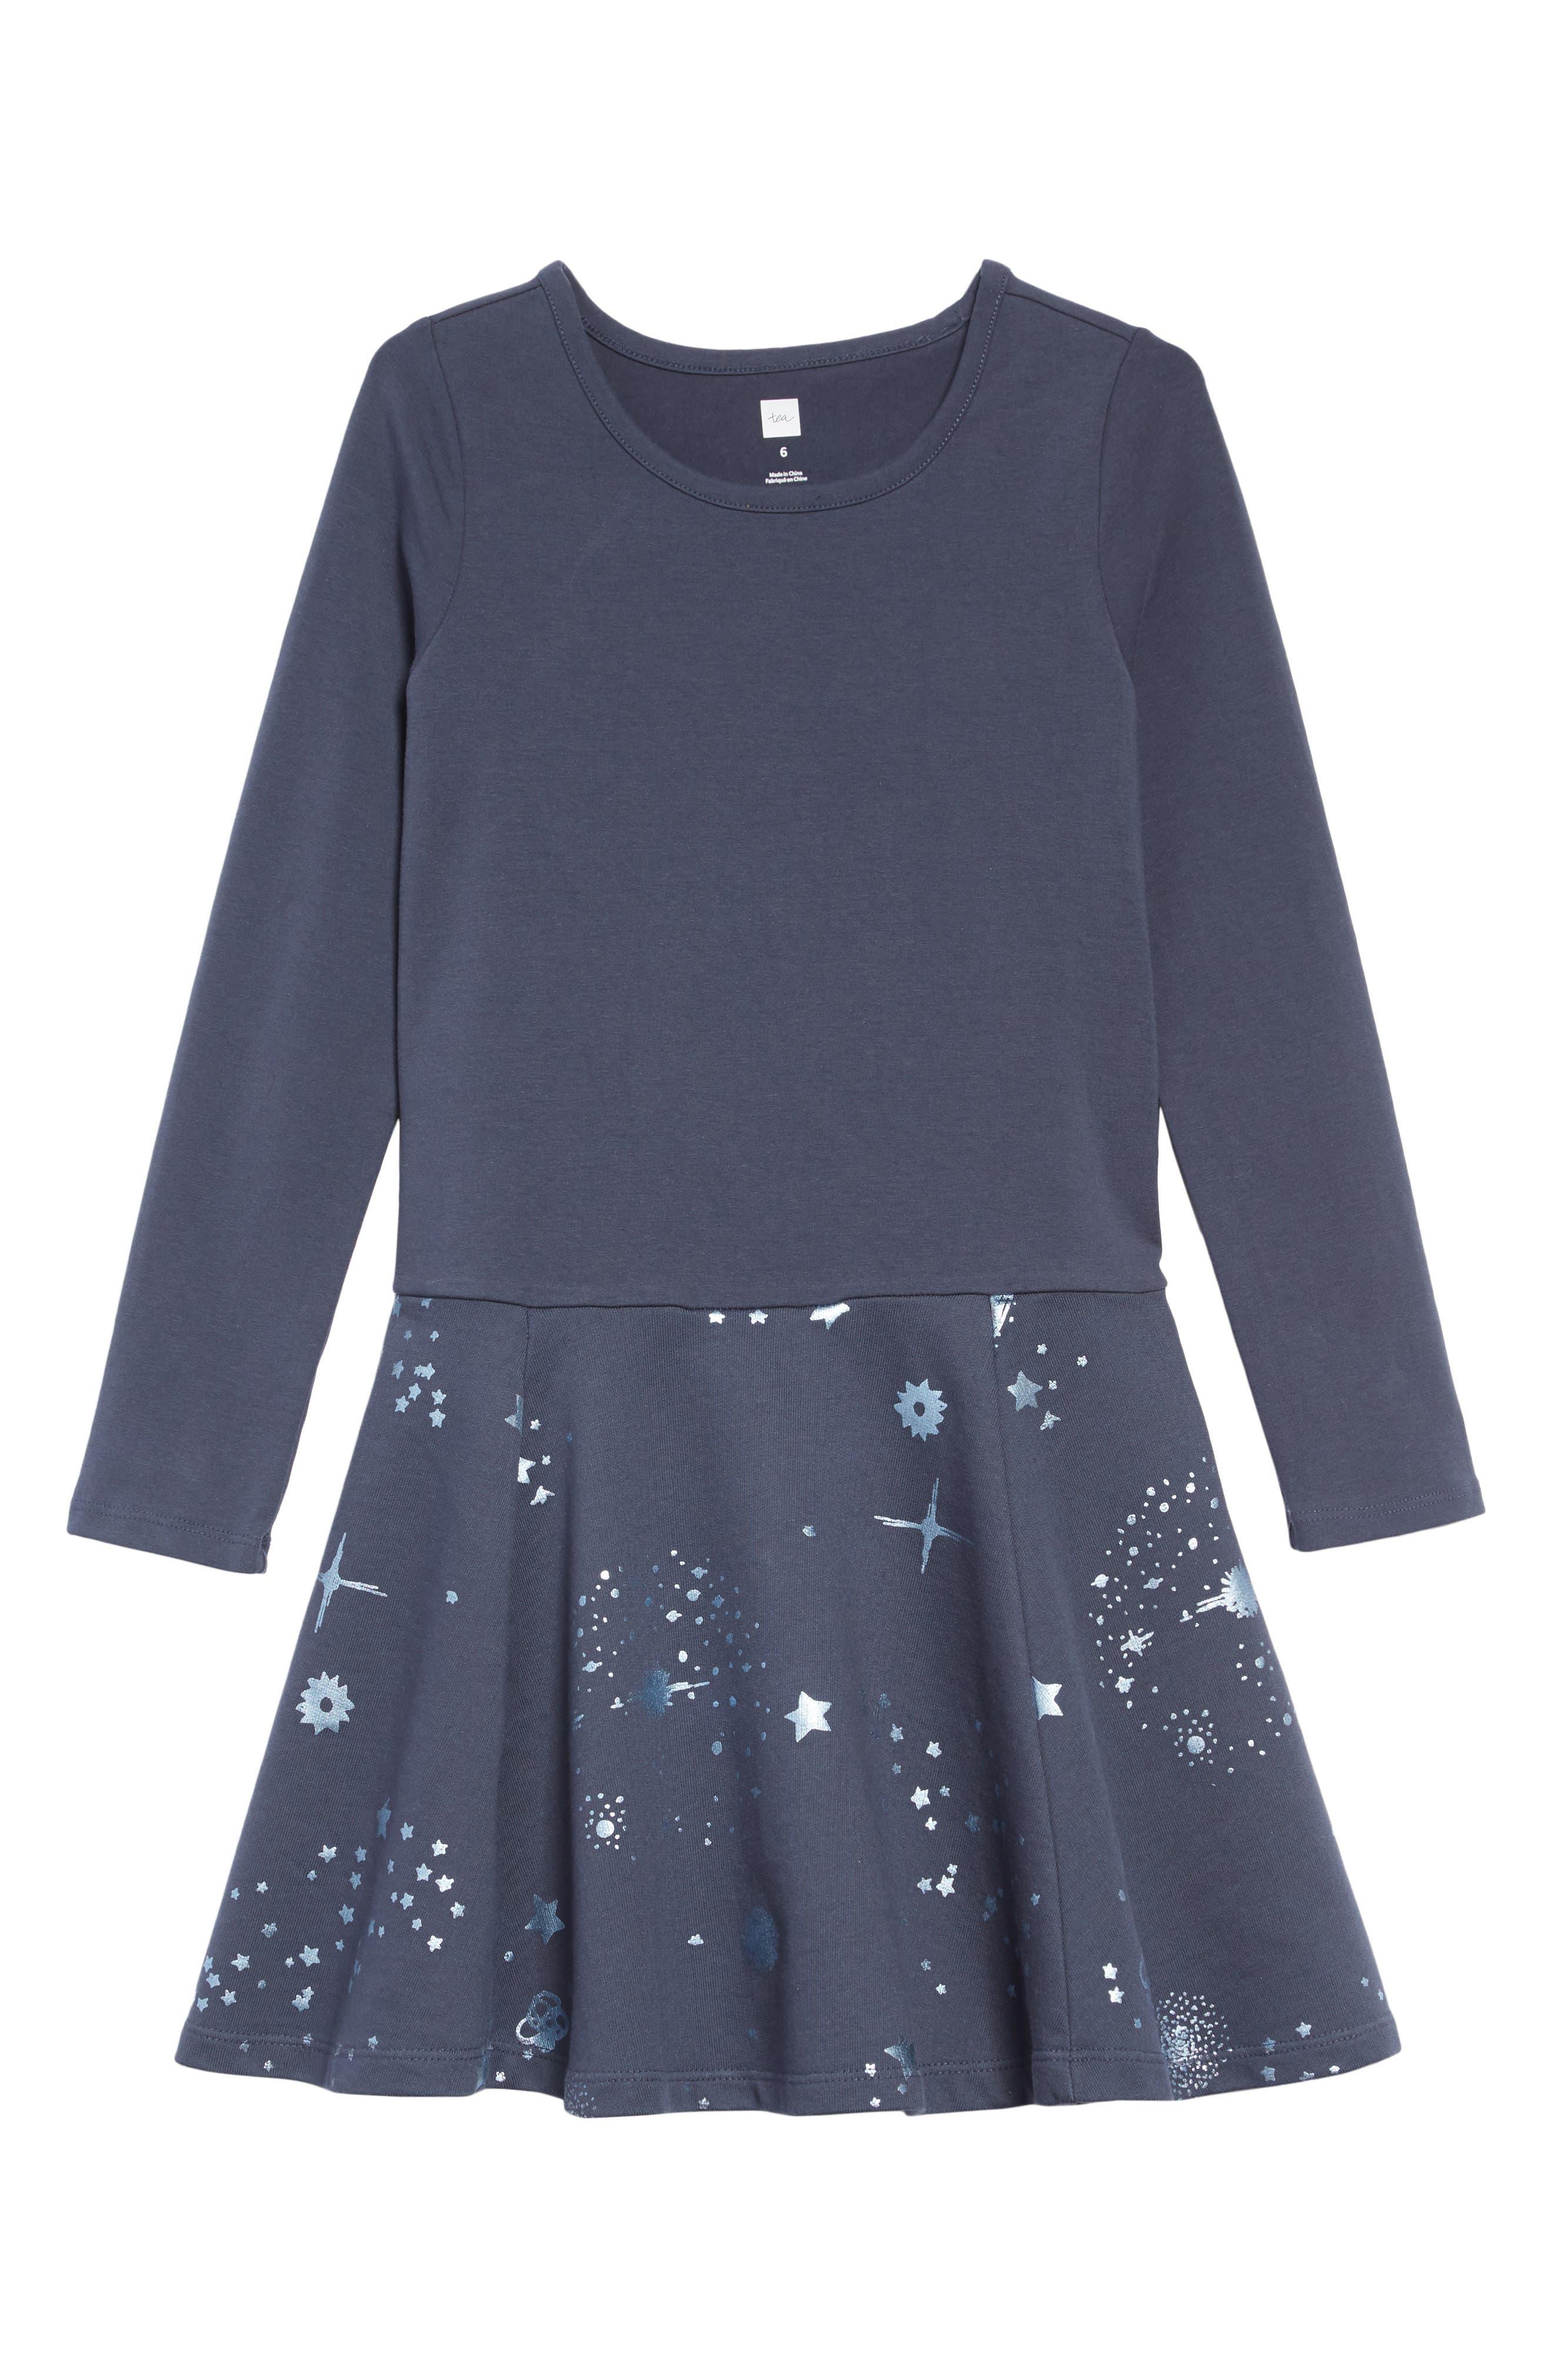 Starry Skies Dress,                         Main,                         color, STARRY SKIES - INDIGO